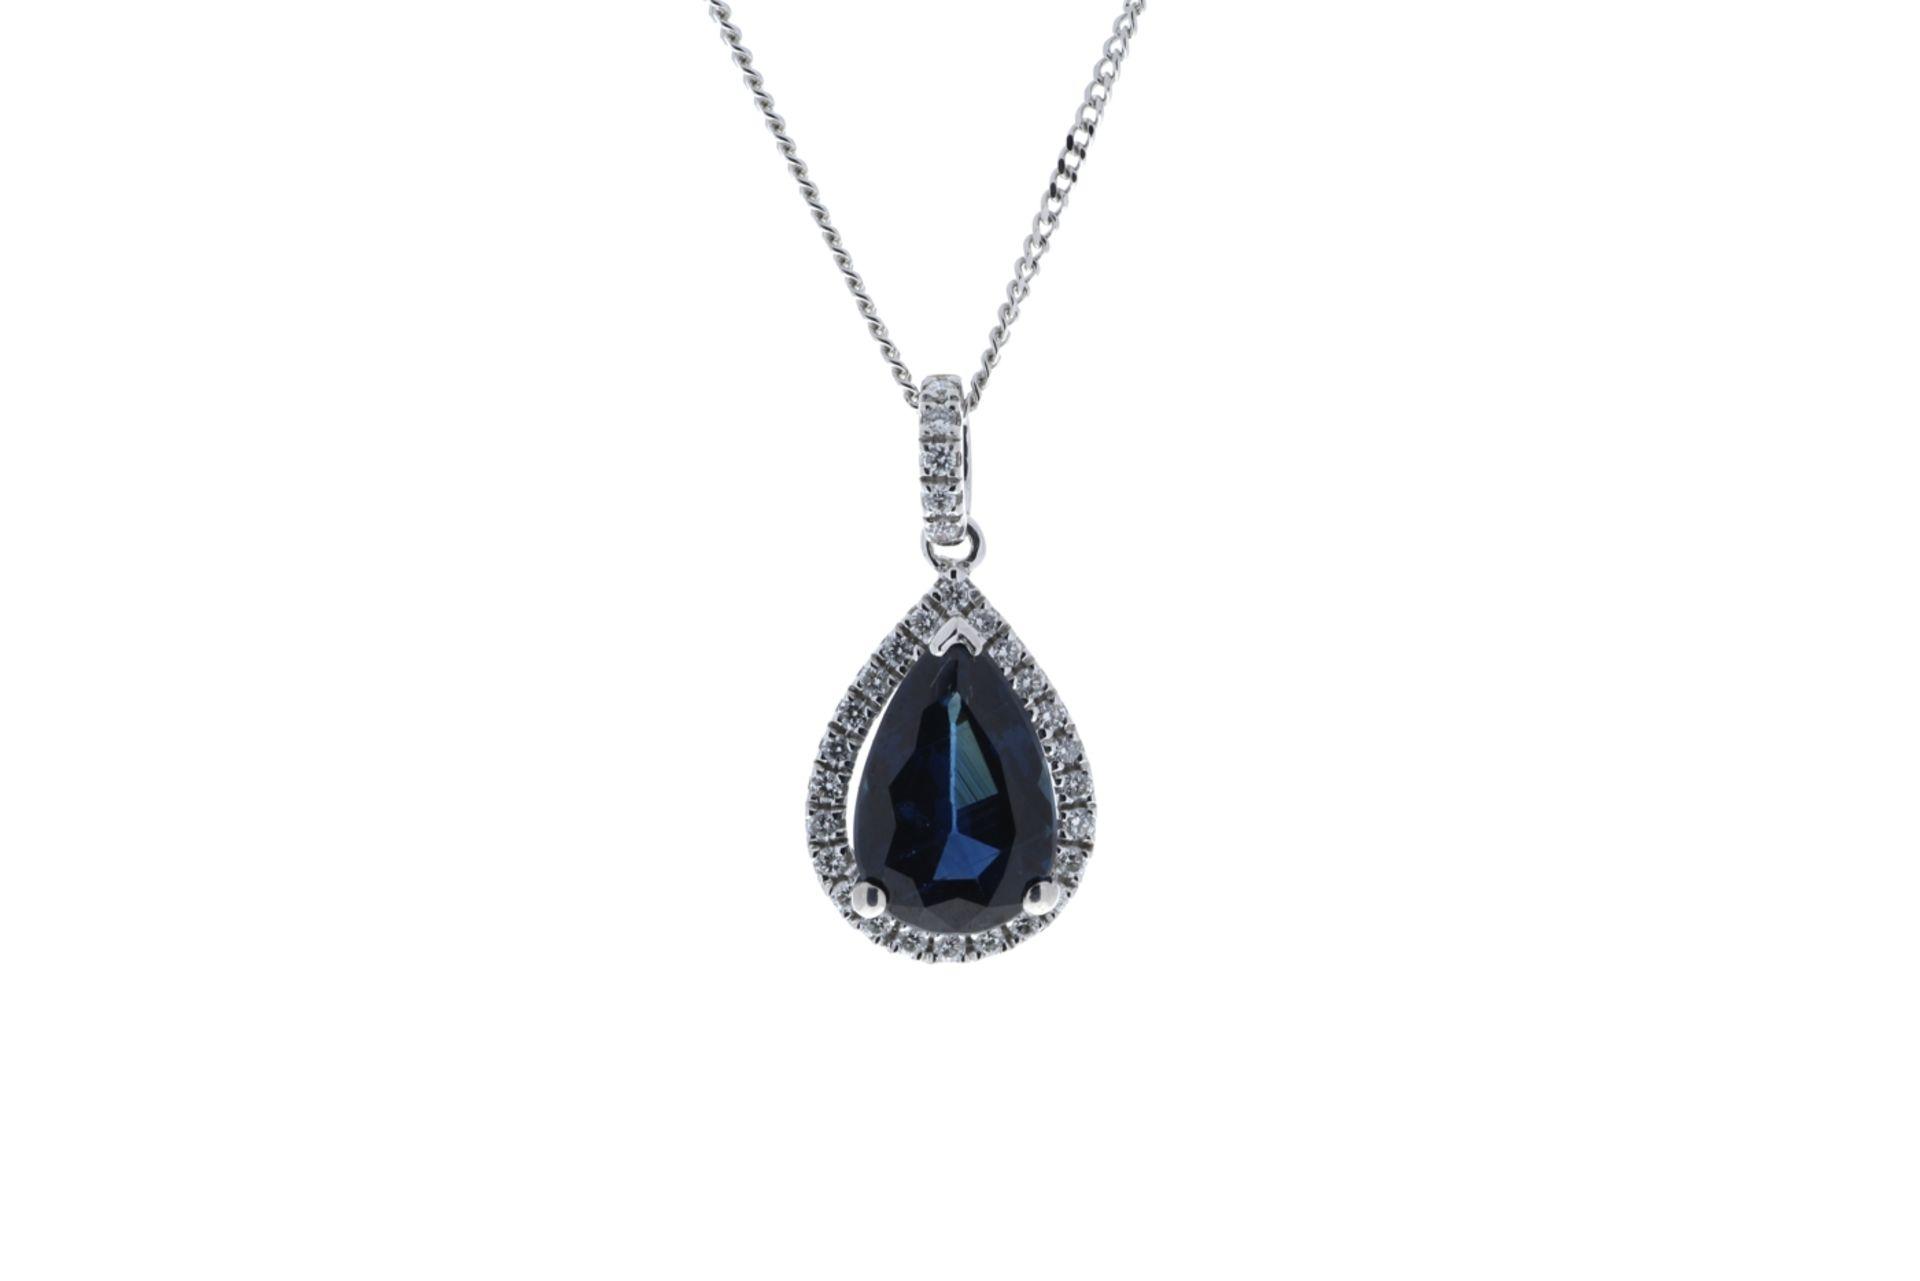 Lot 45 - 18k White Gold Pear Shape Sapphire In Diamond Halo Pendant 0.18k (P 2.35)